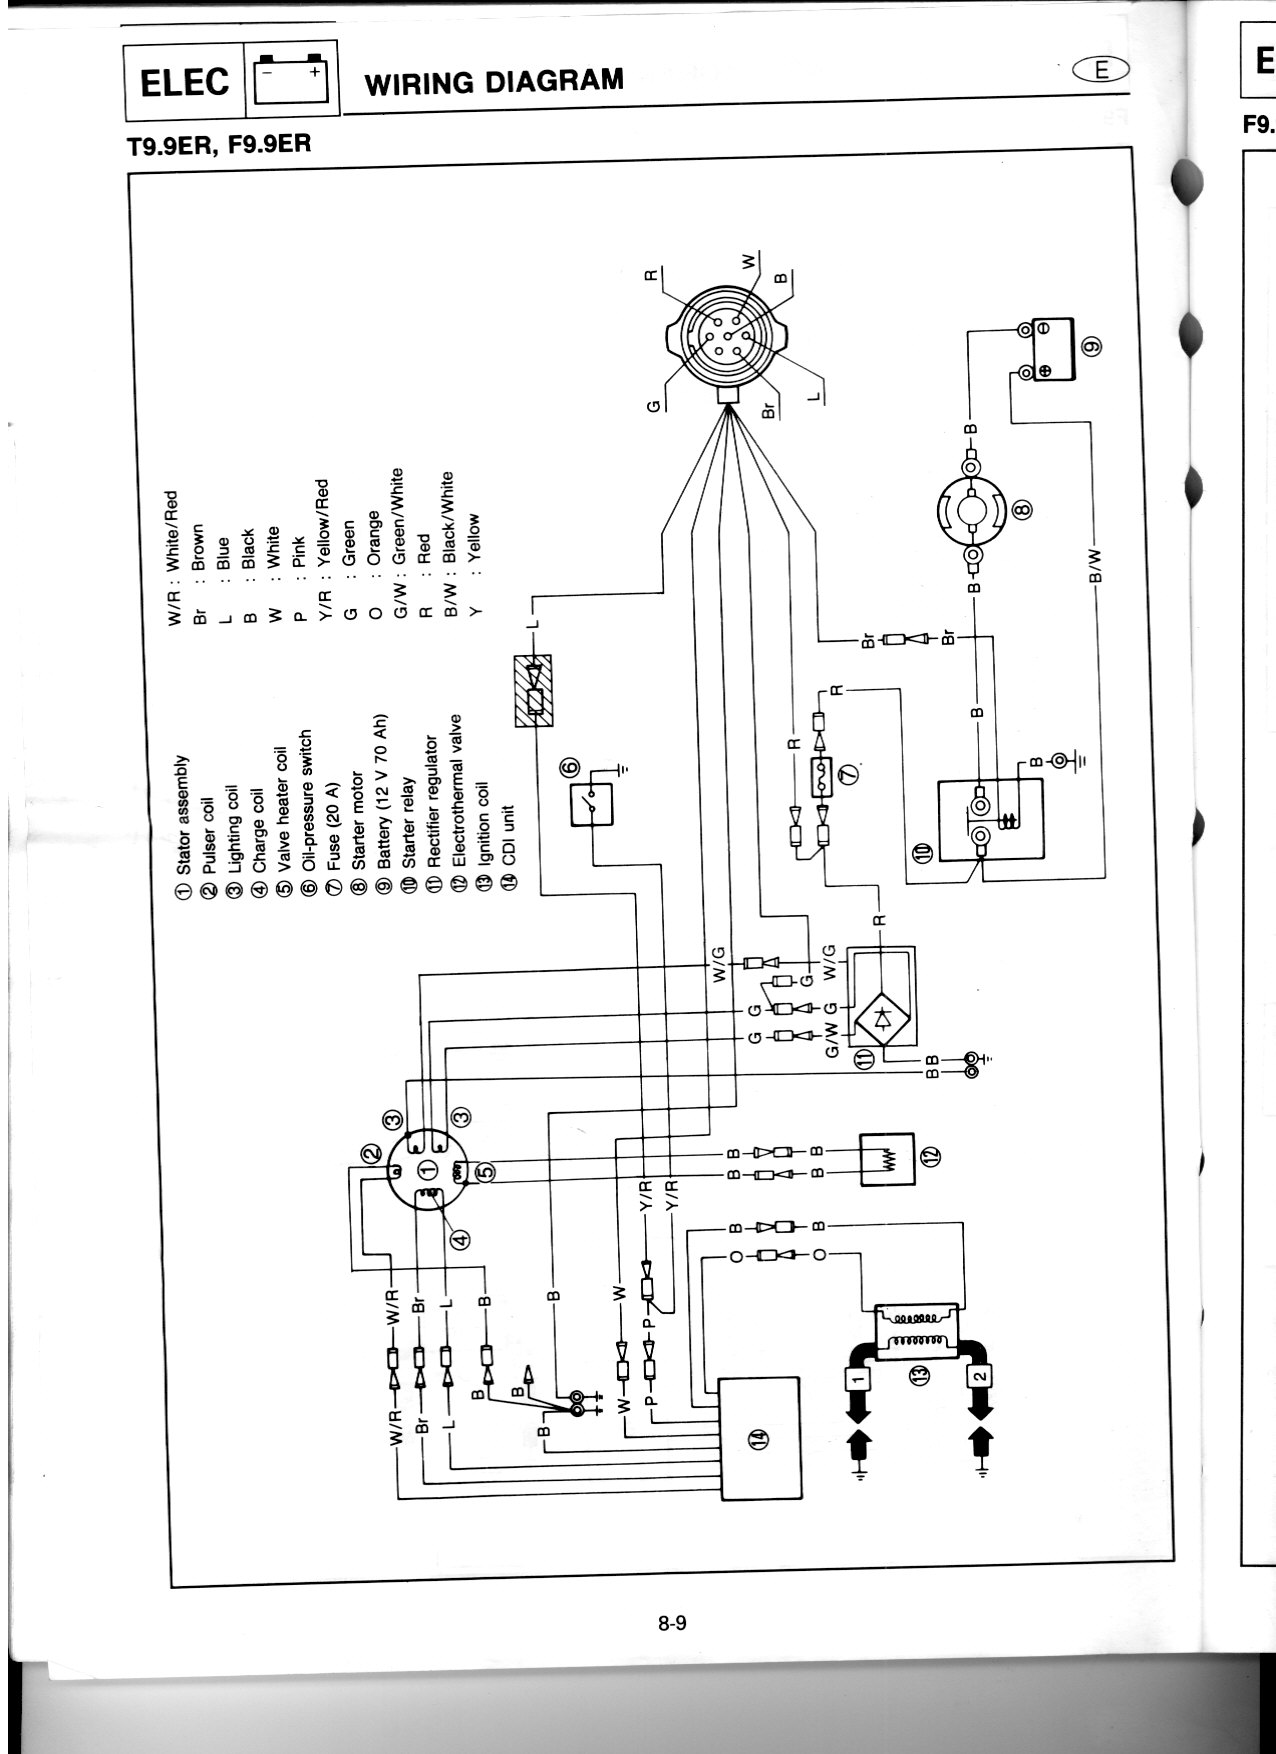 6 Wire Rectifier Wiring Diagram